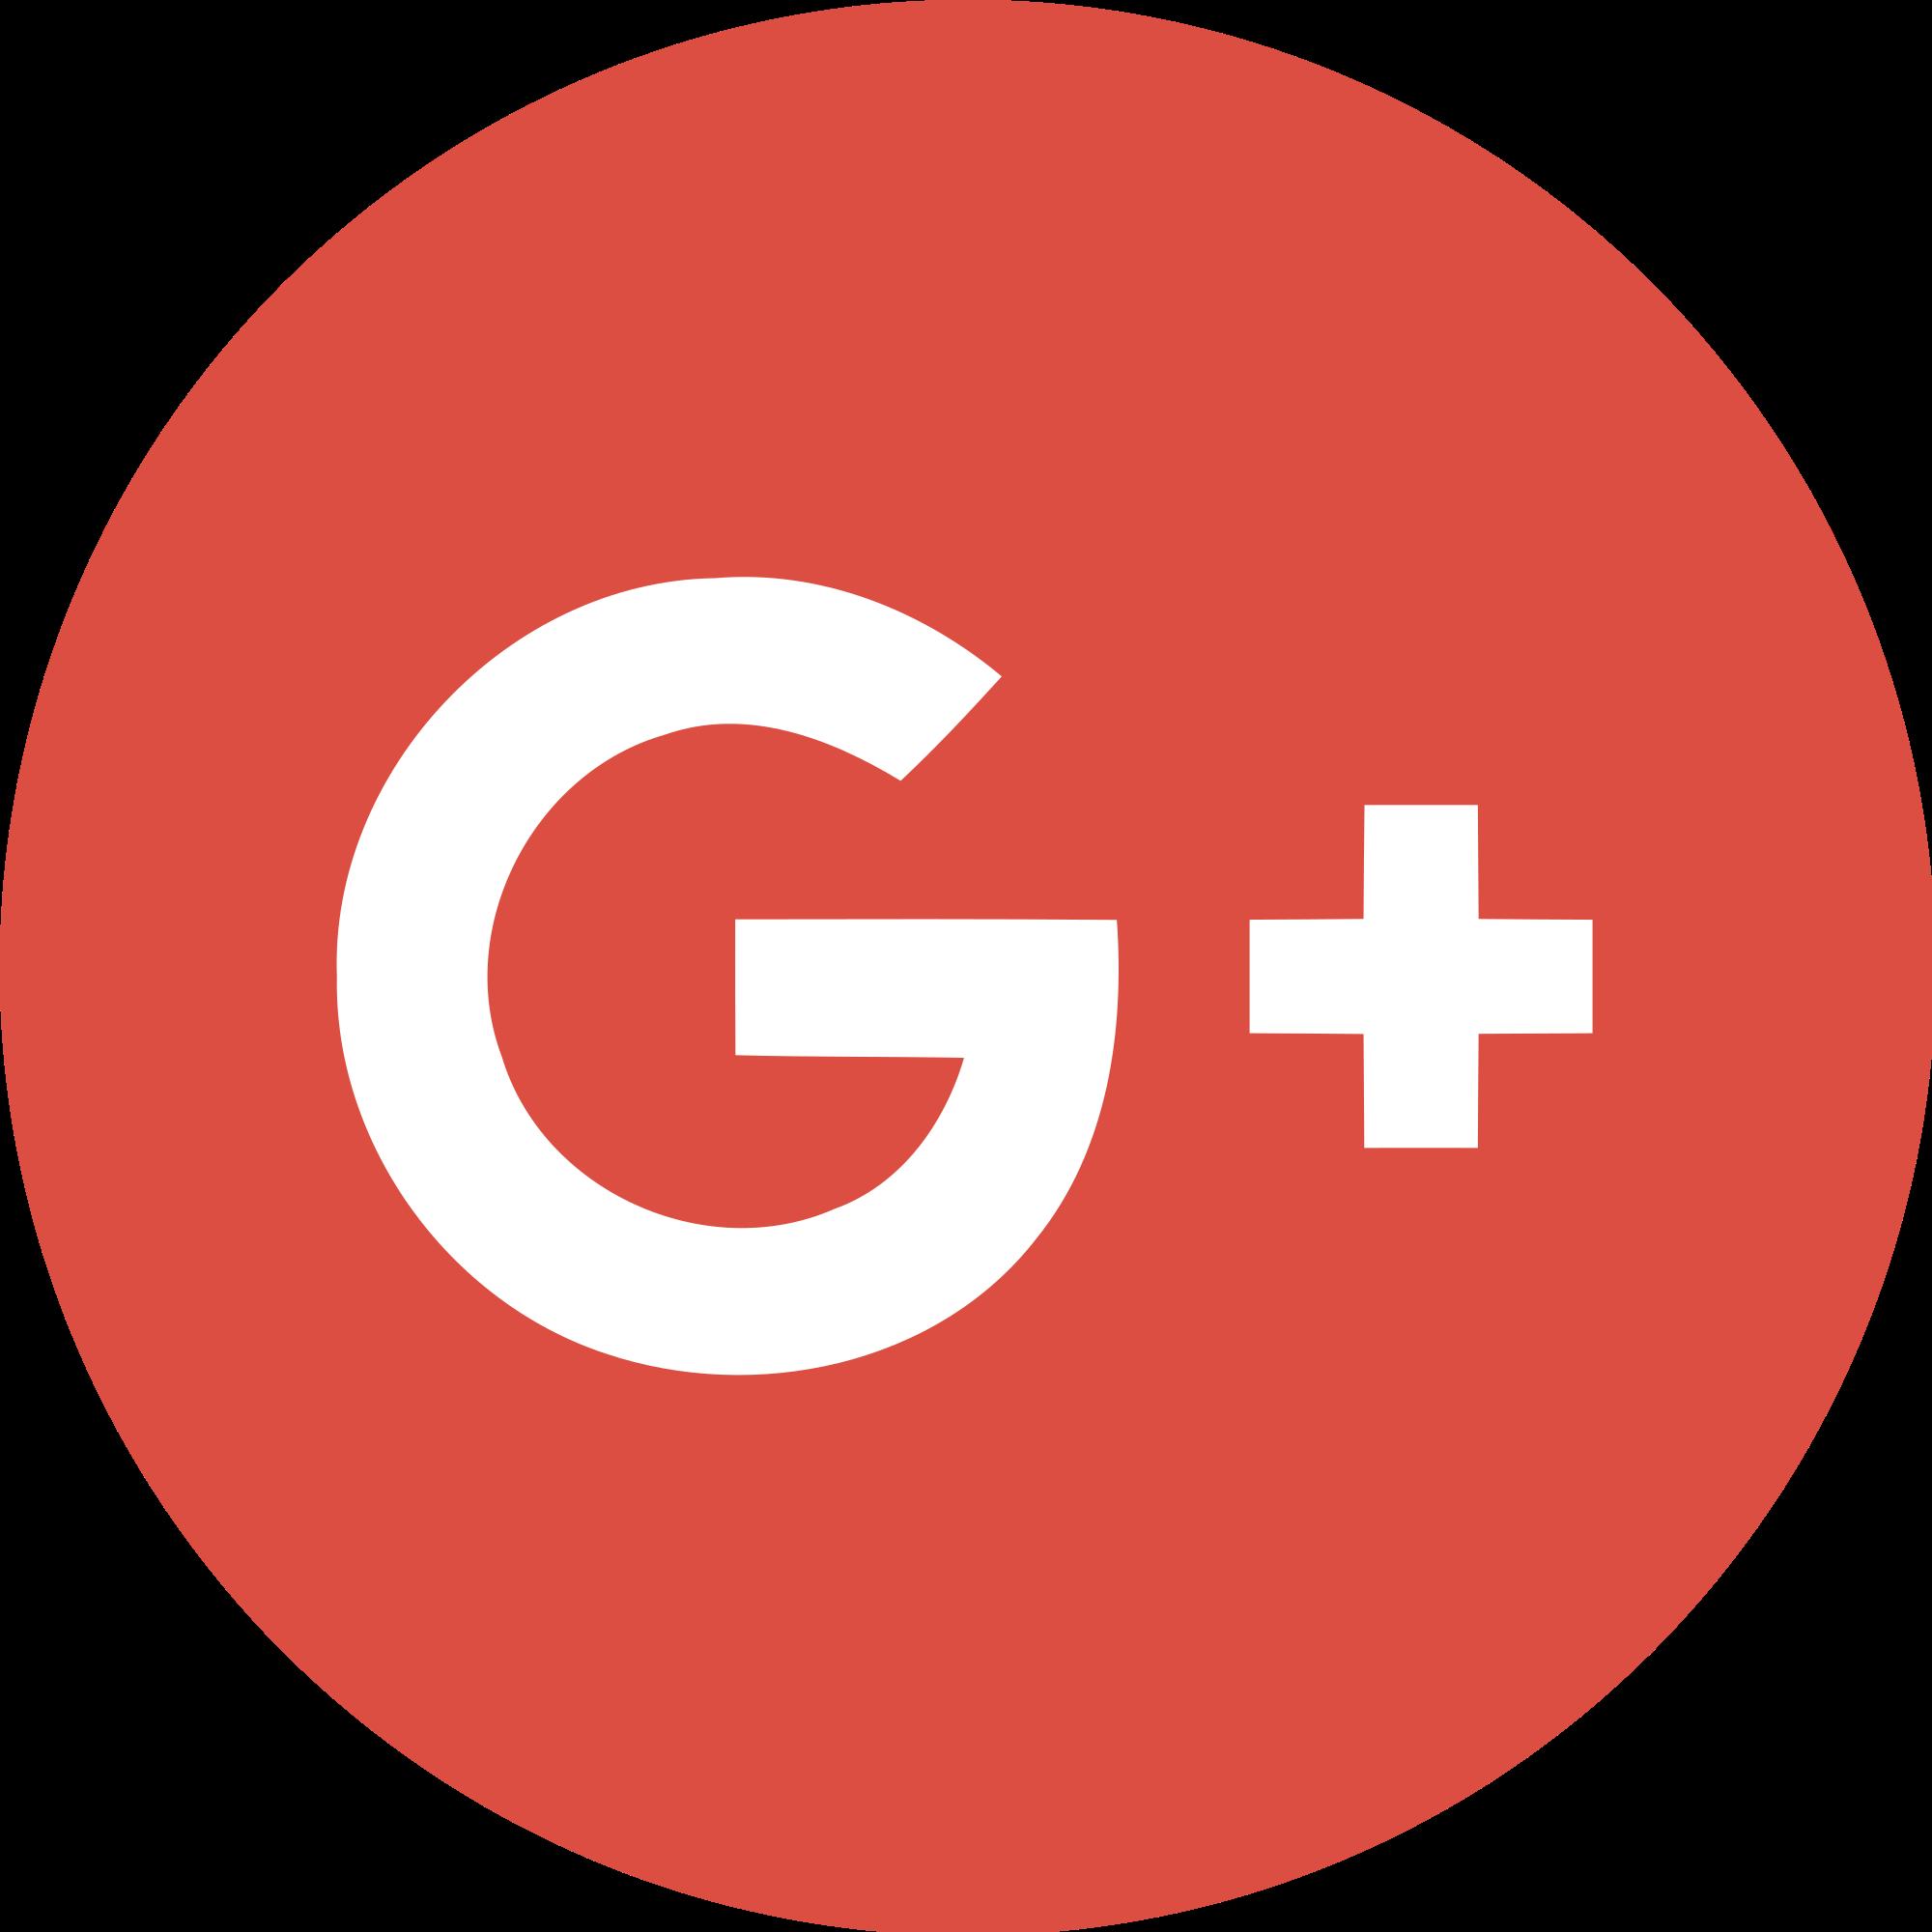 Google logo png 2015. File plus svg wikimedia